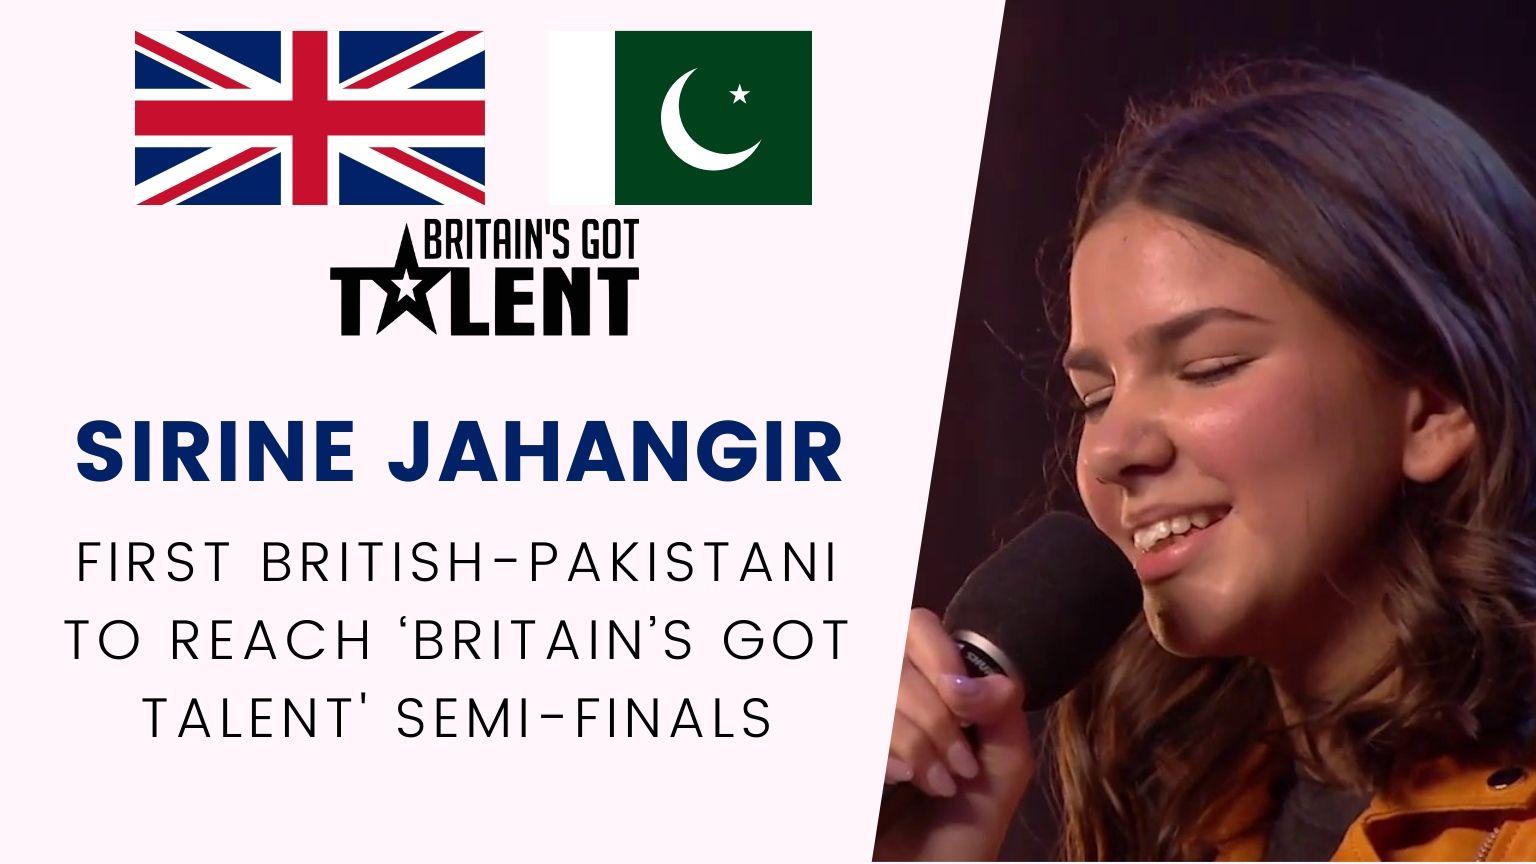 Sirine Jahangir | First British-Pakistani to reach 'Britain's Got Talent' semi-finals